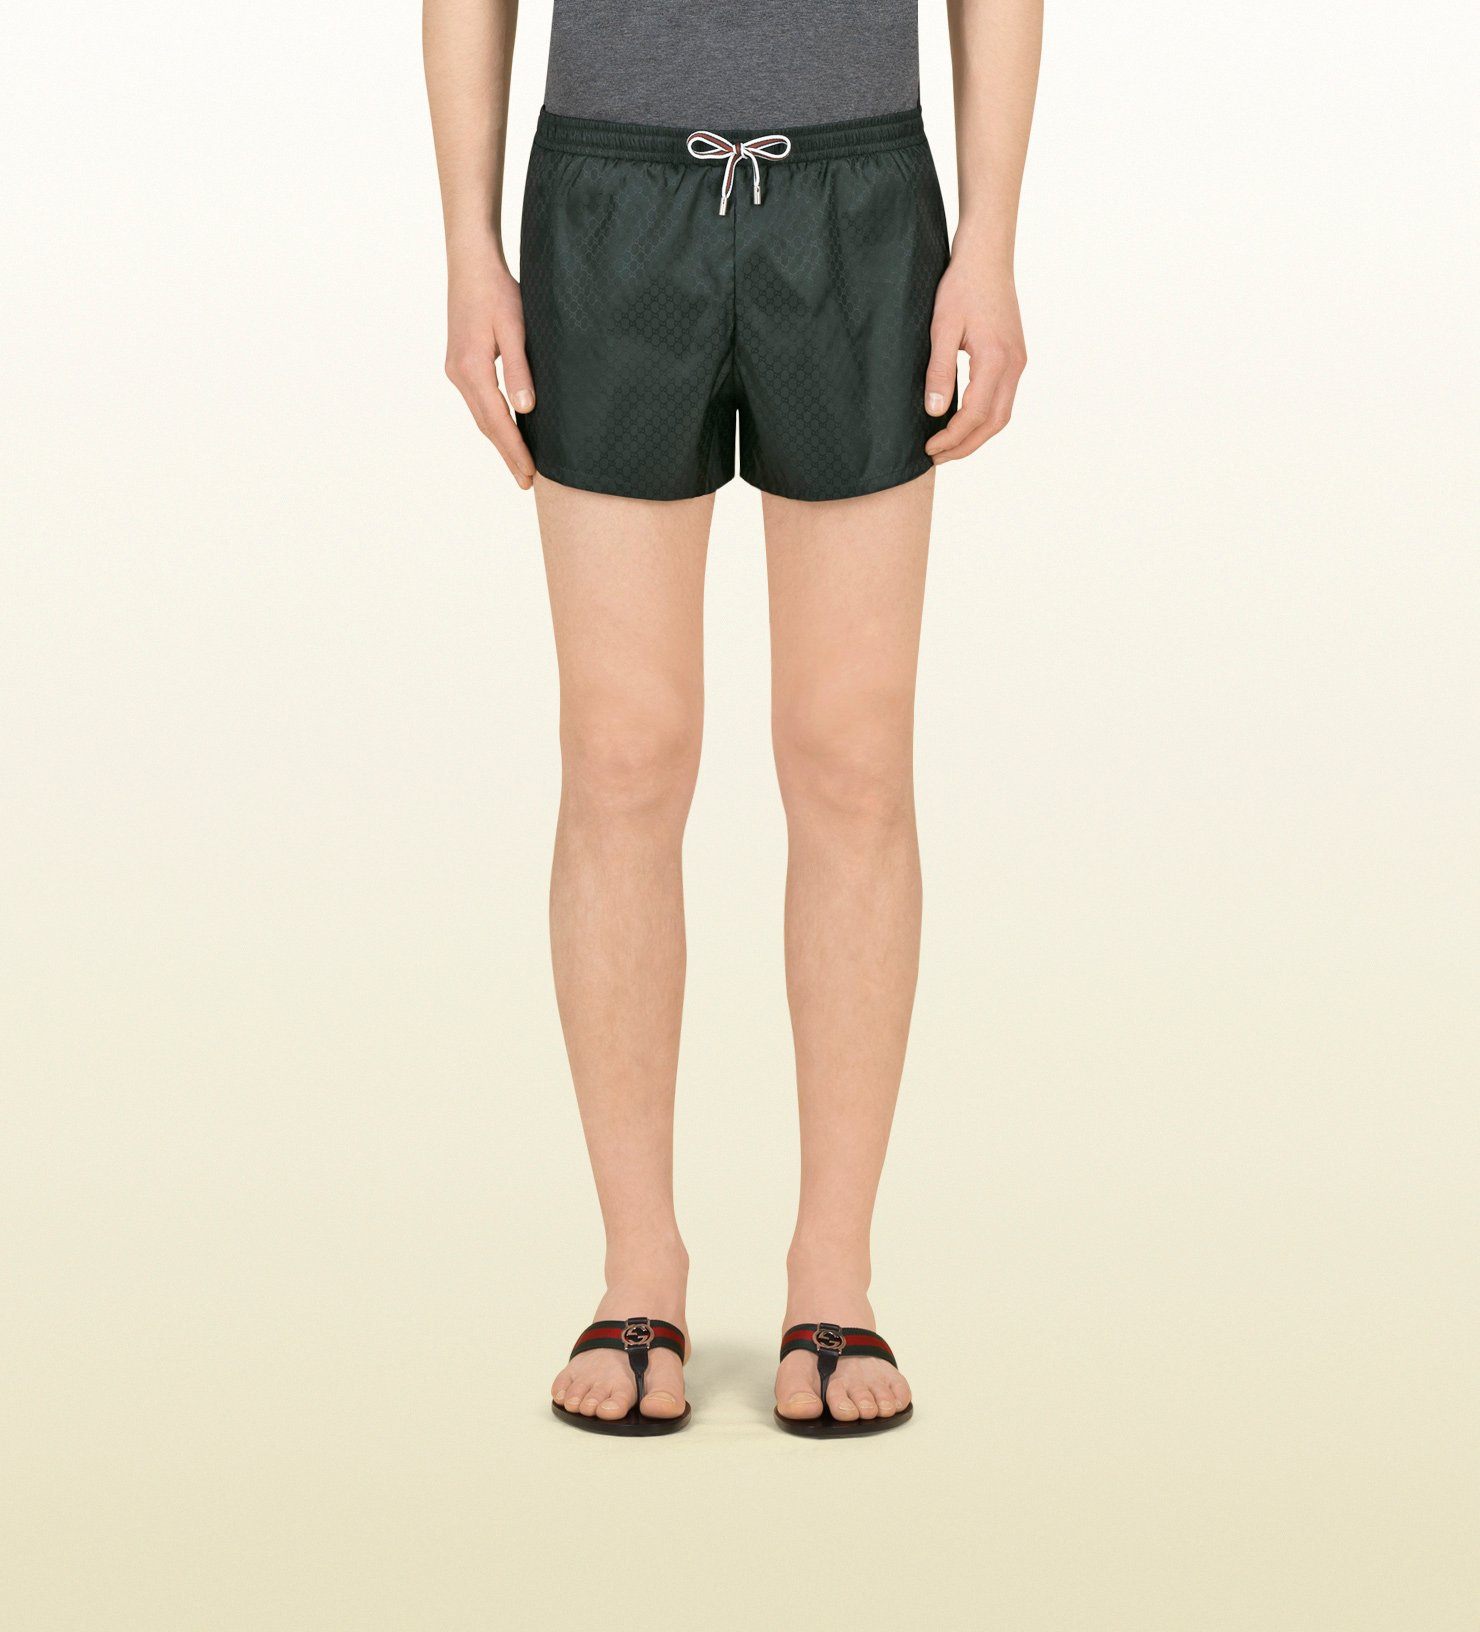 b5576ceb32 Gucci Dark Green Mini Gg Nylon Swim Short in Green for Men - Lyst